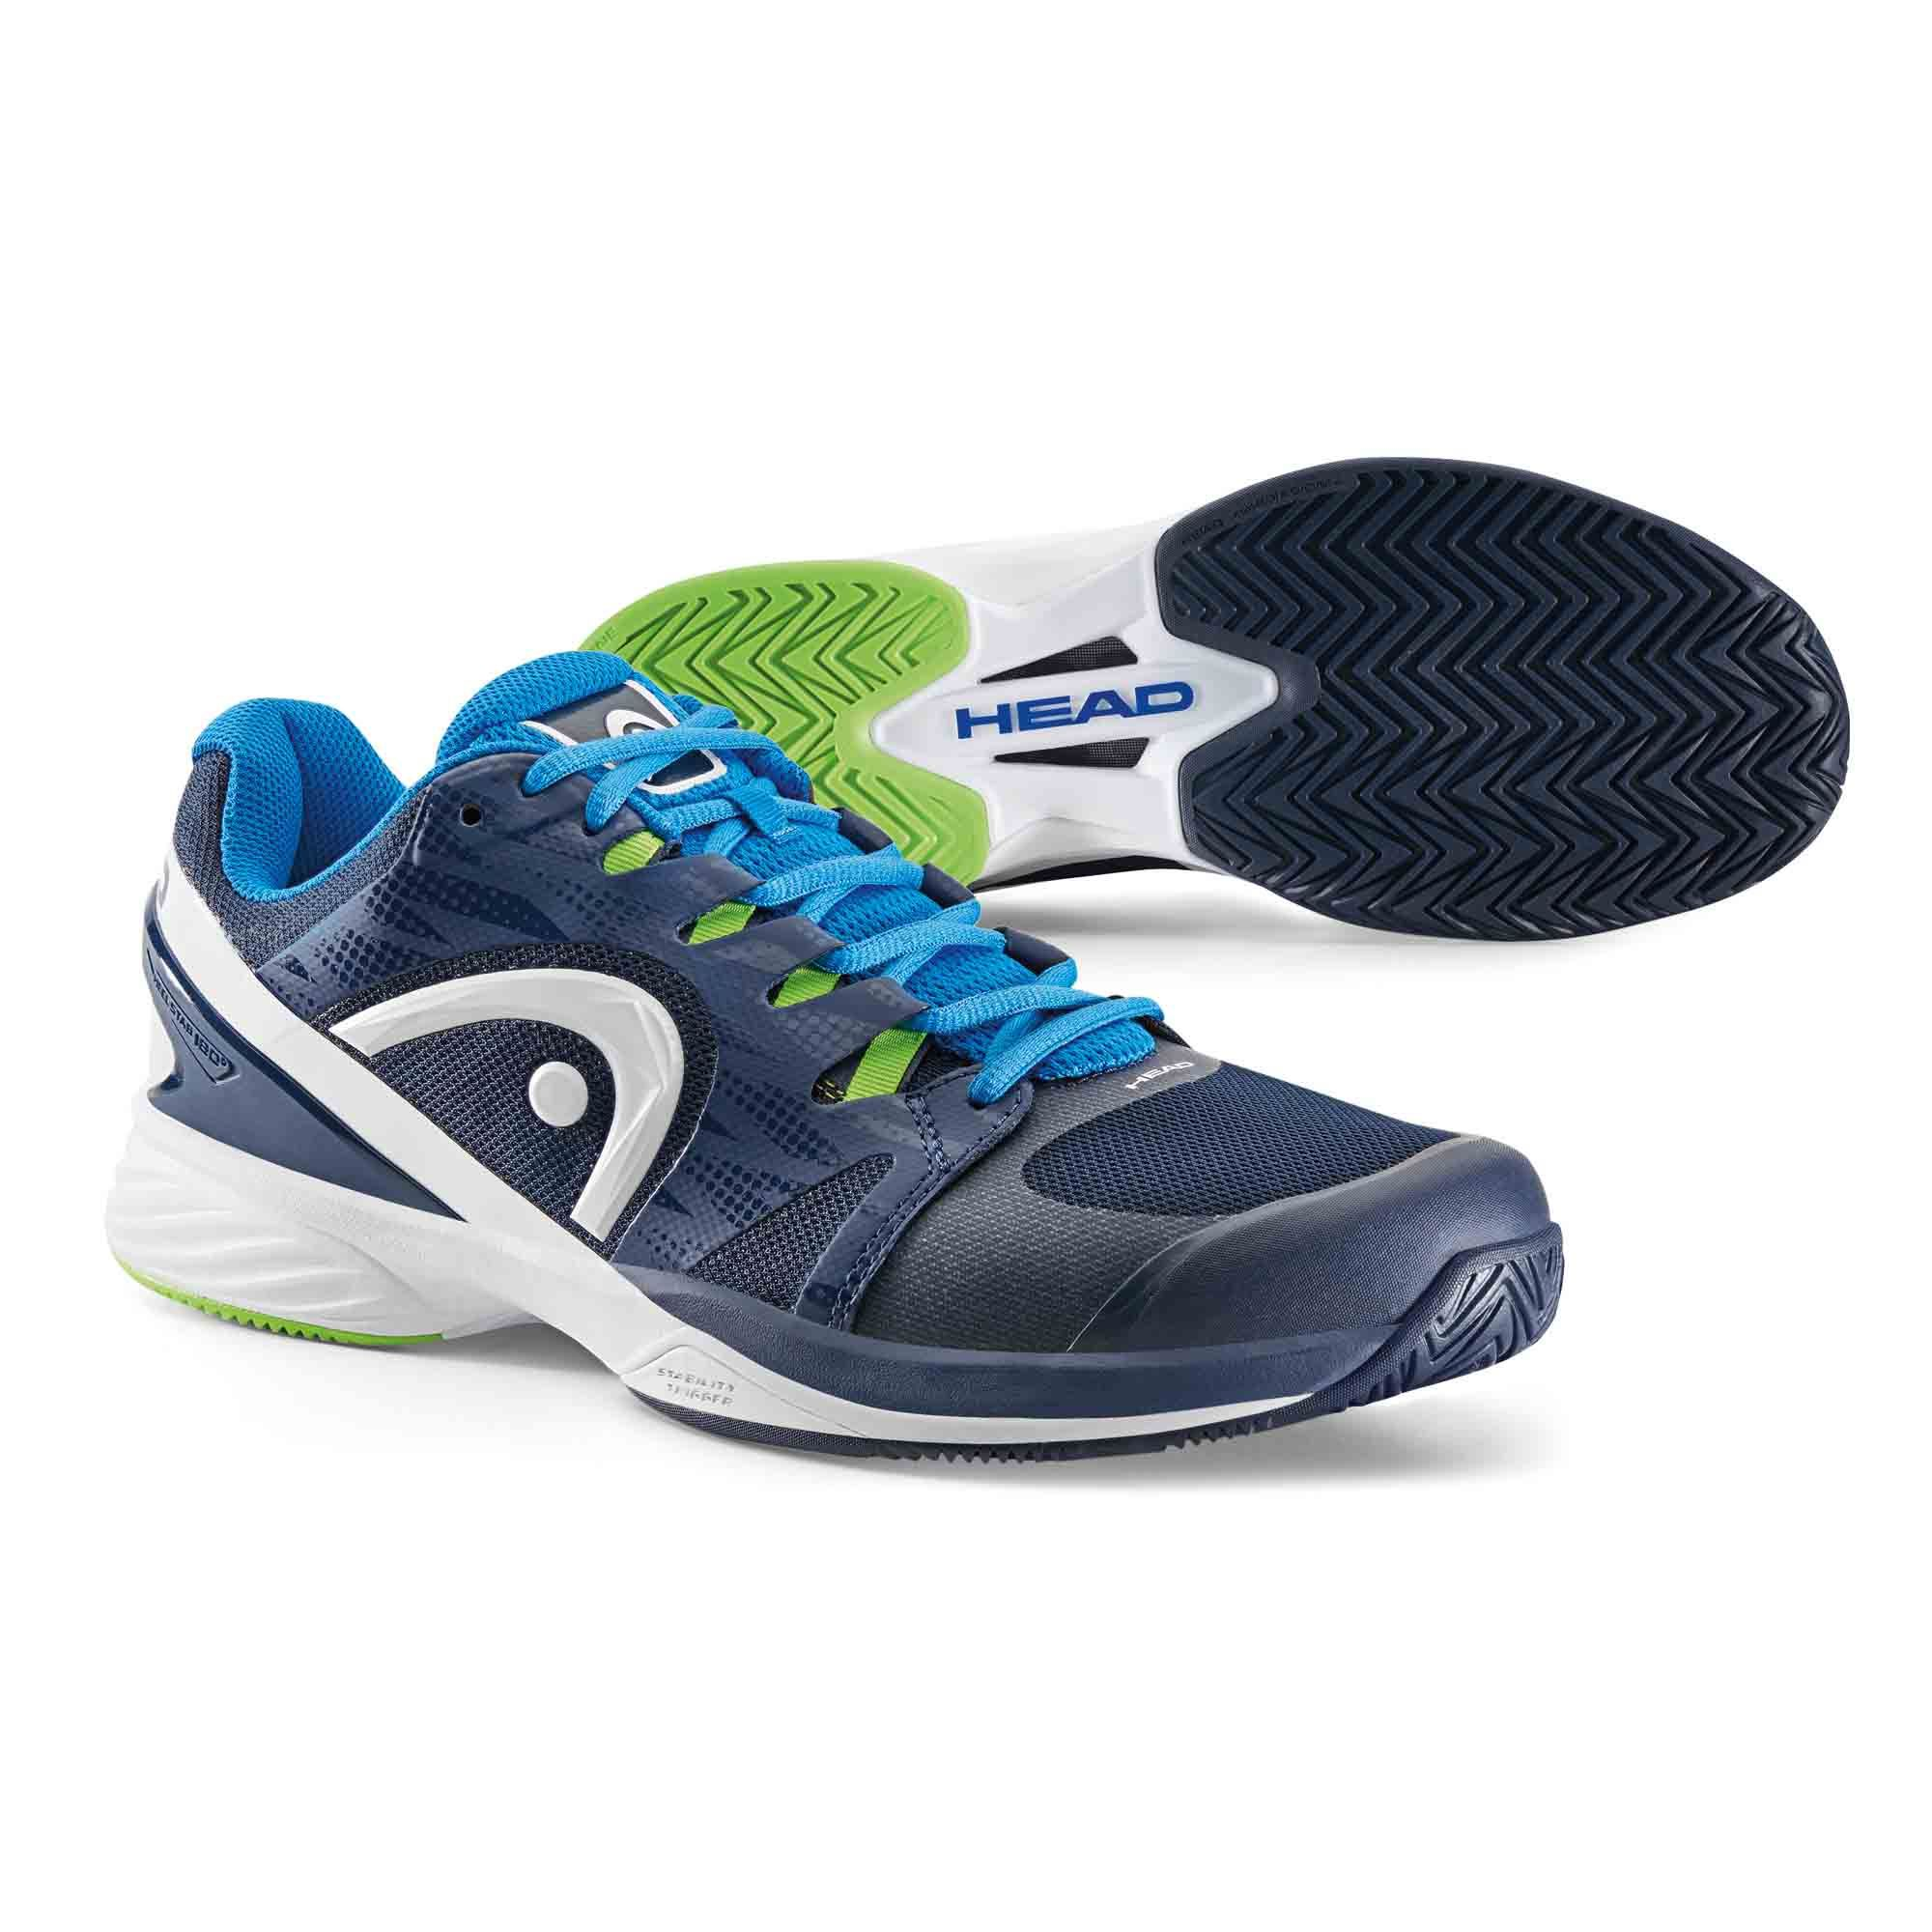 nitro pro mens tennis shoes